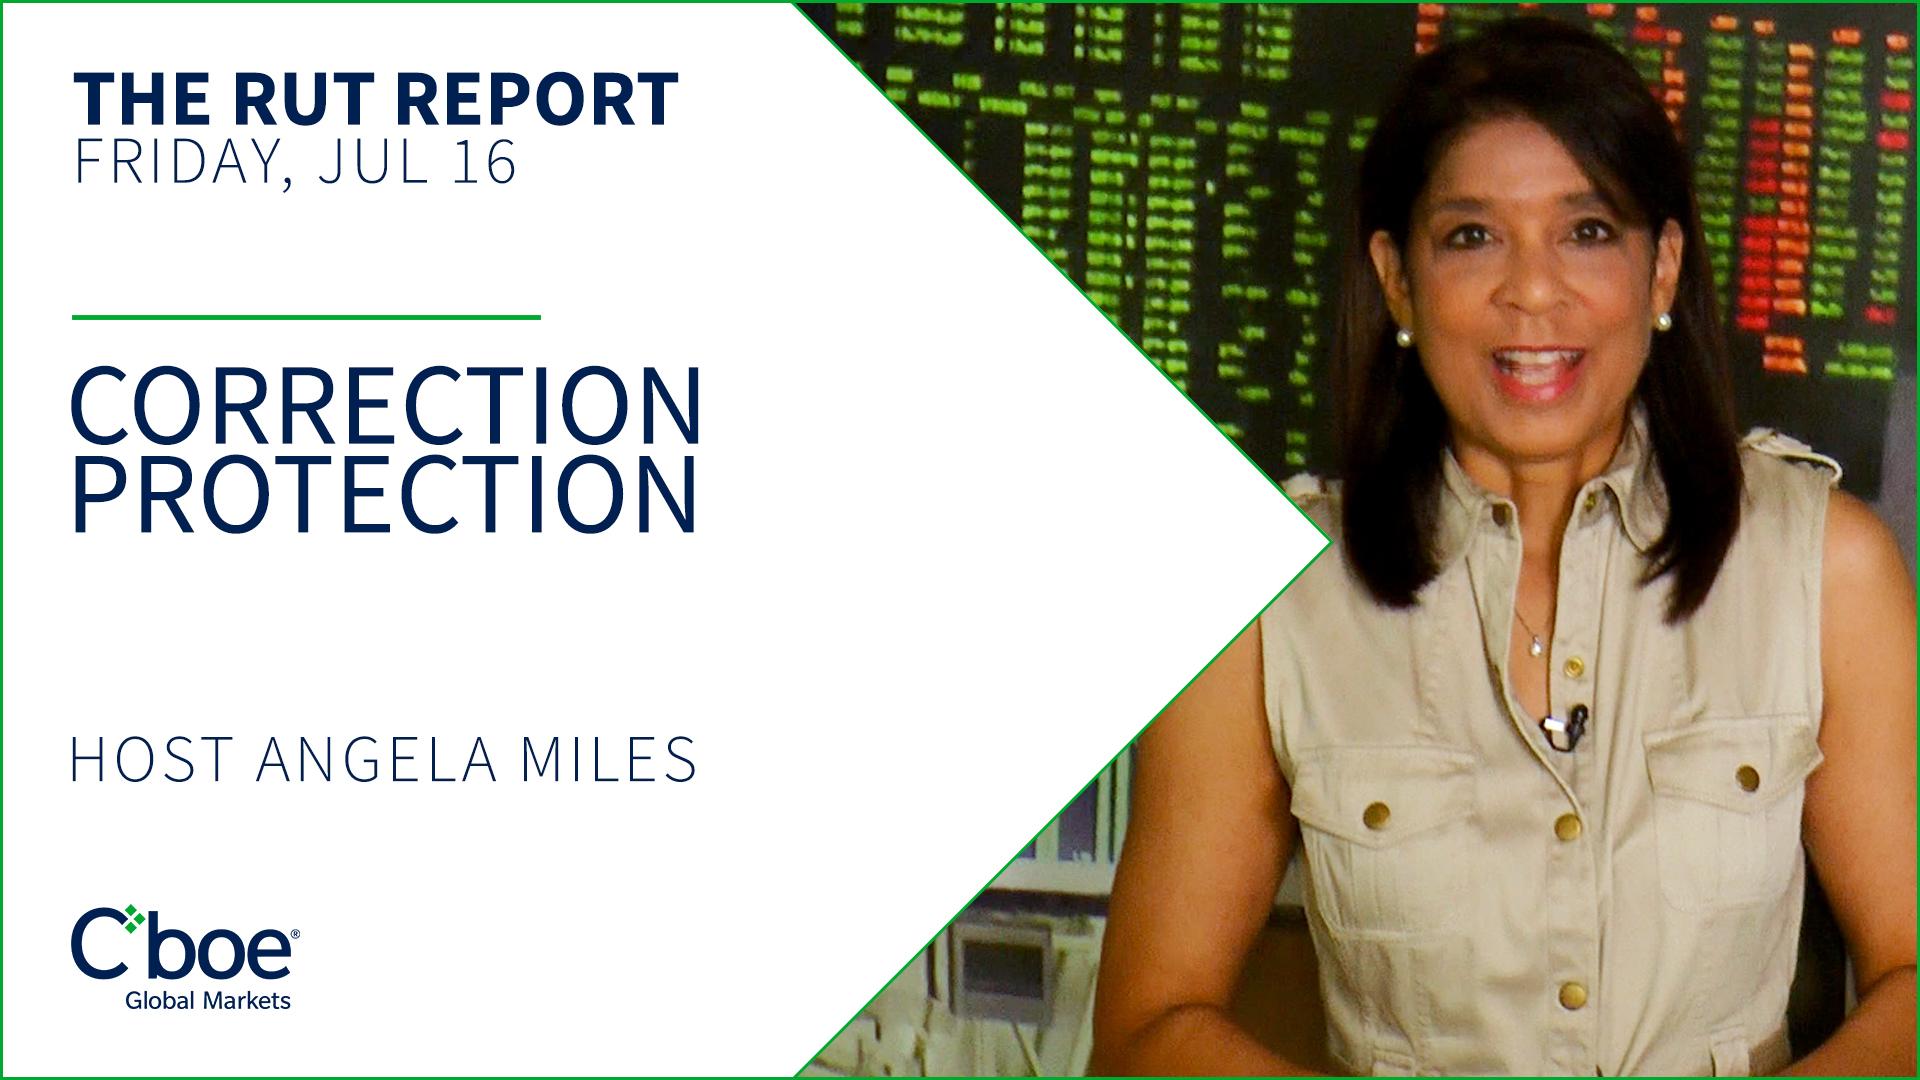 Correction Protection Thumbnail